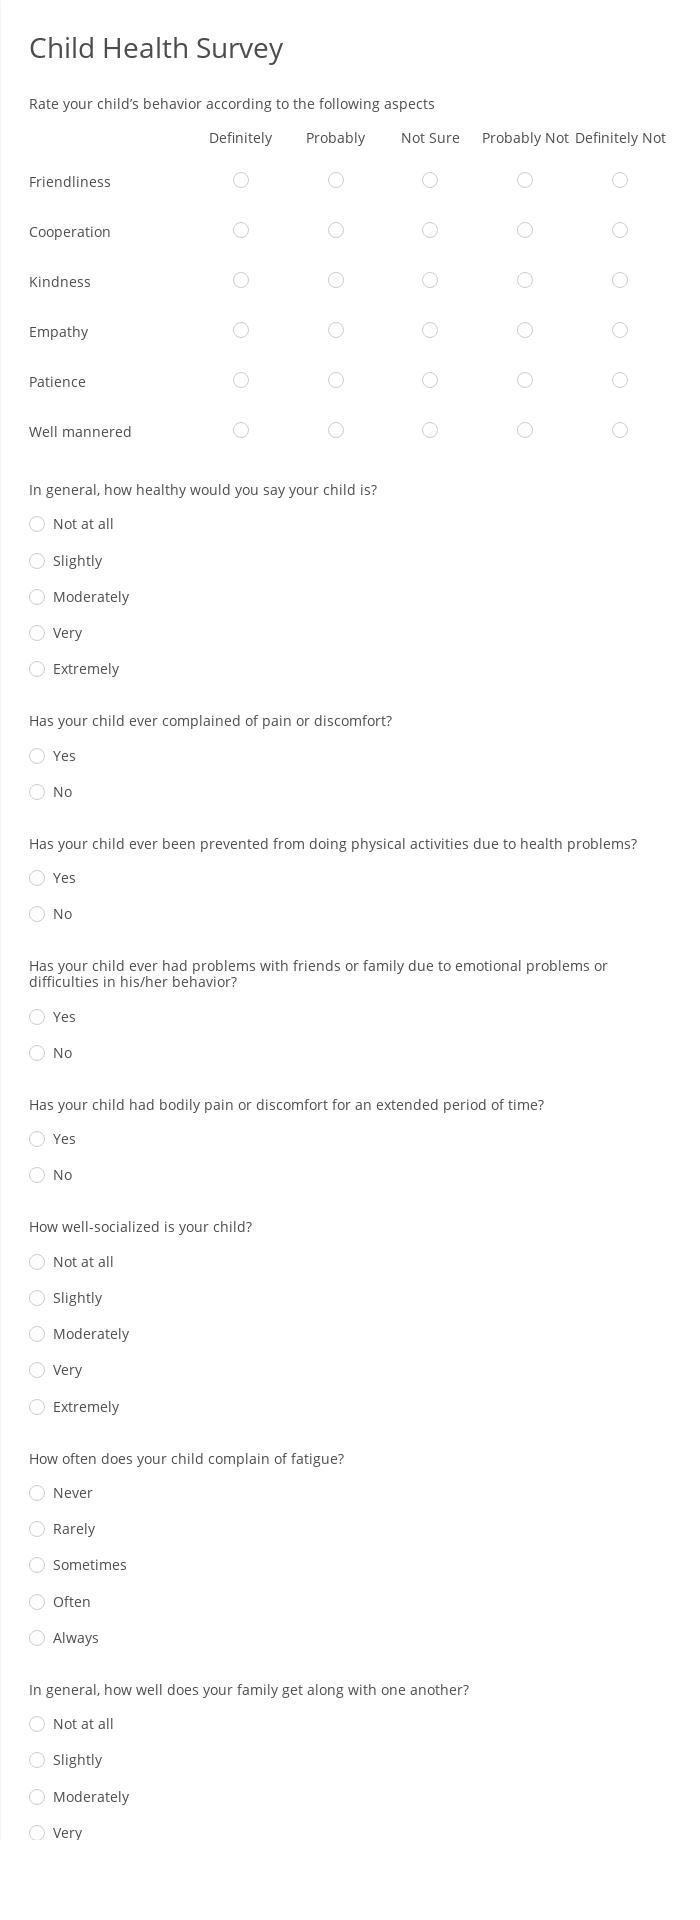 Child Health Survey